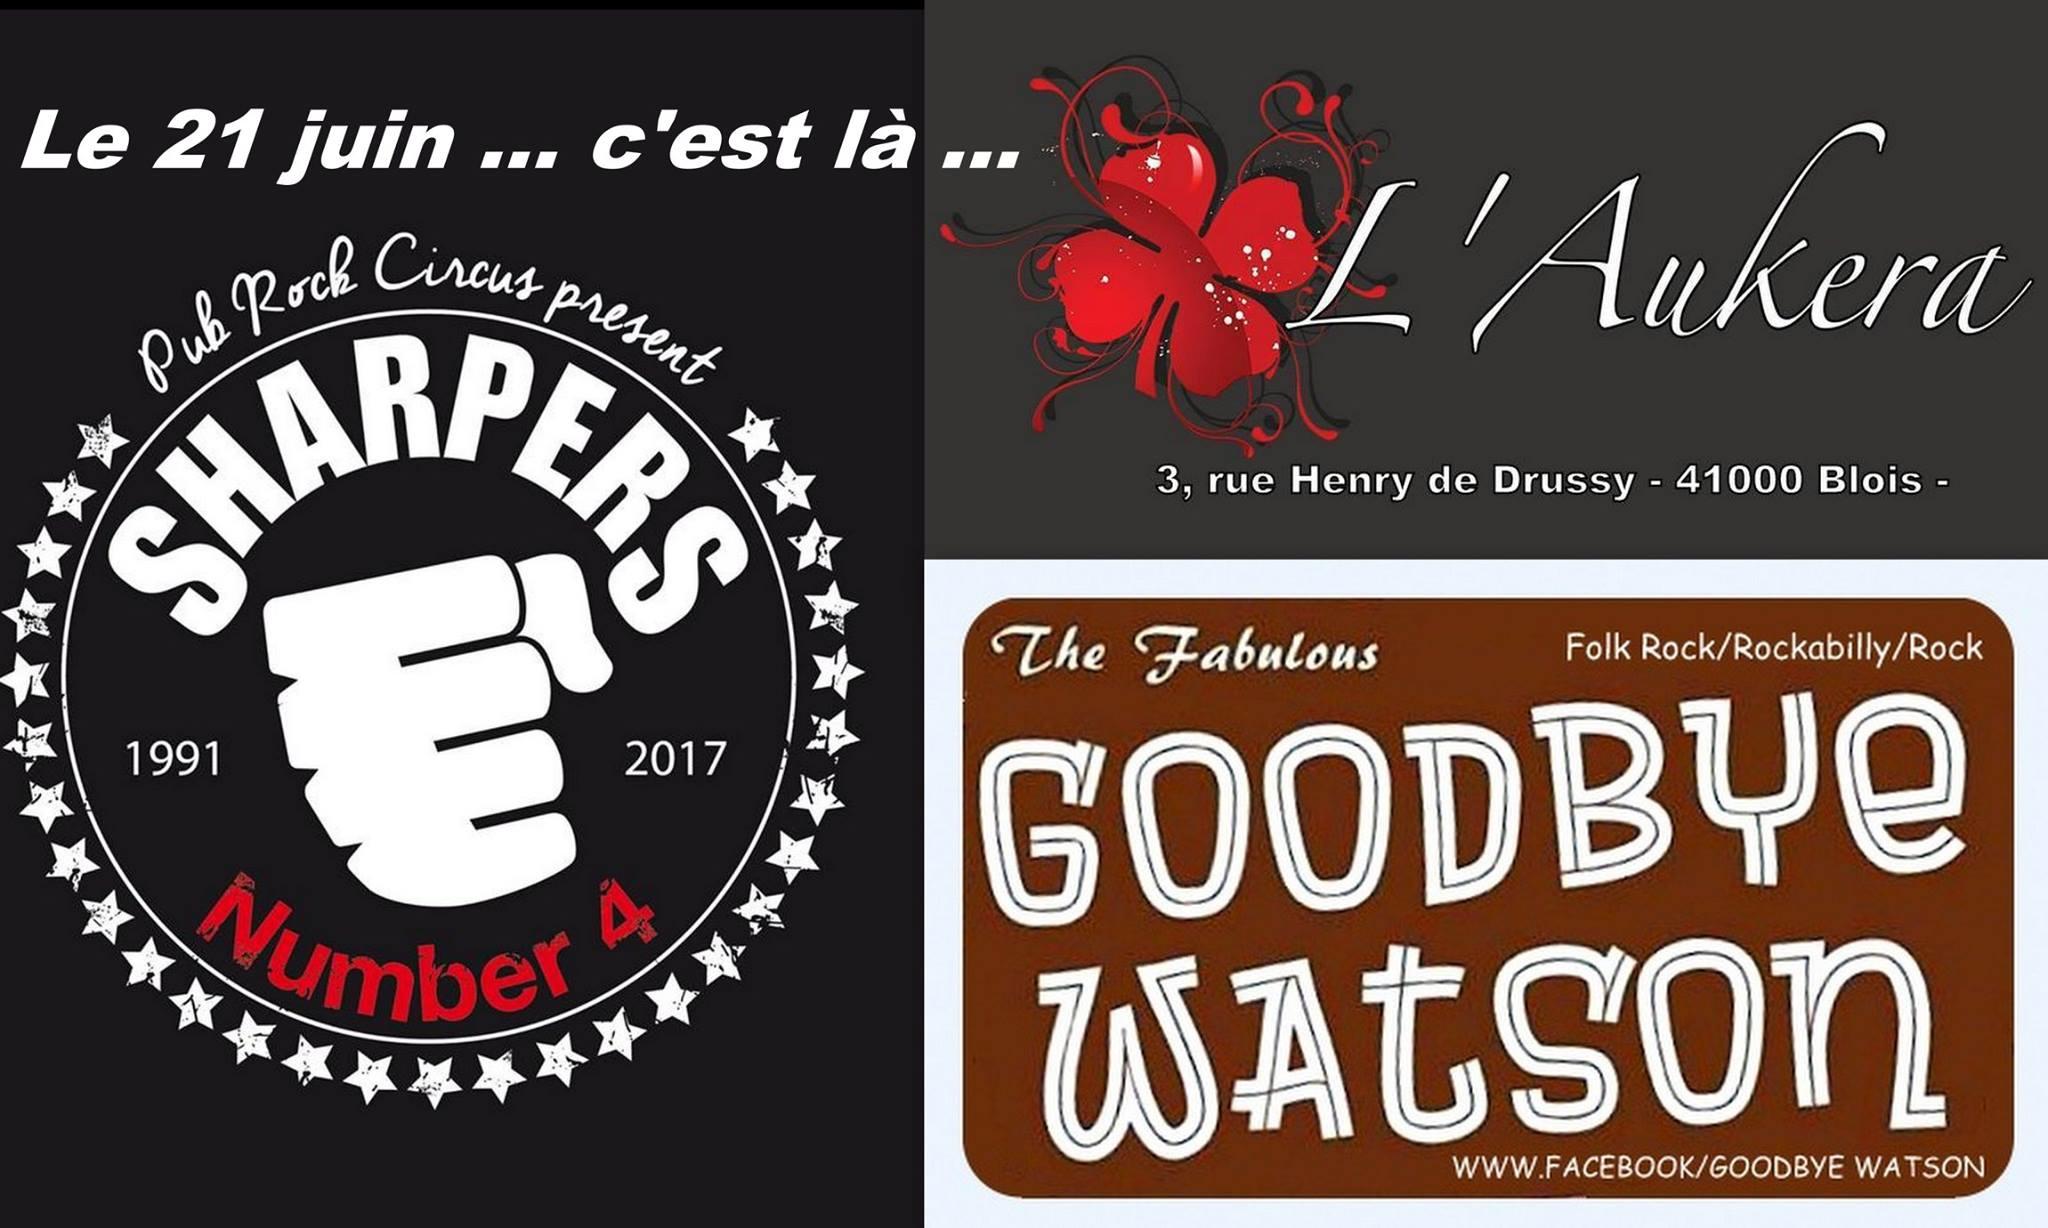 "21 juin 2017 Goodbye Watson, Sharpers à Blois ""l'Aukera"""